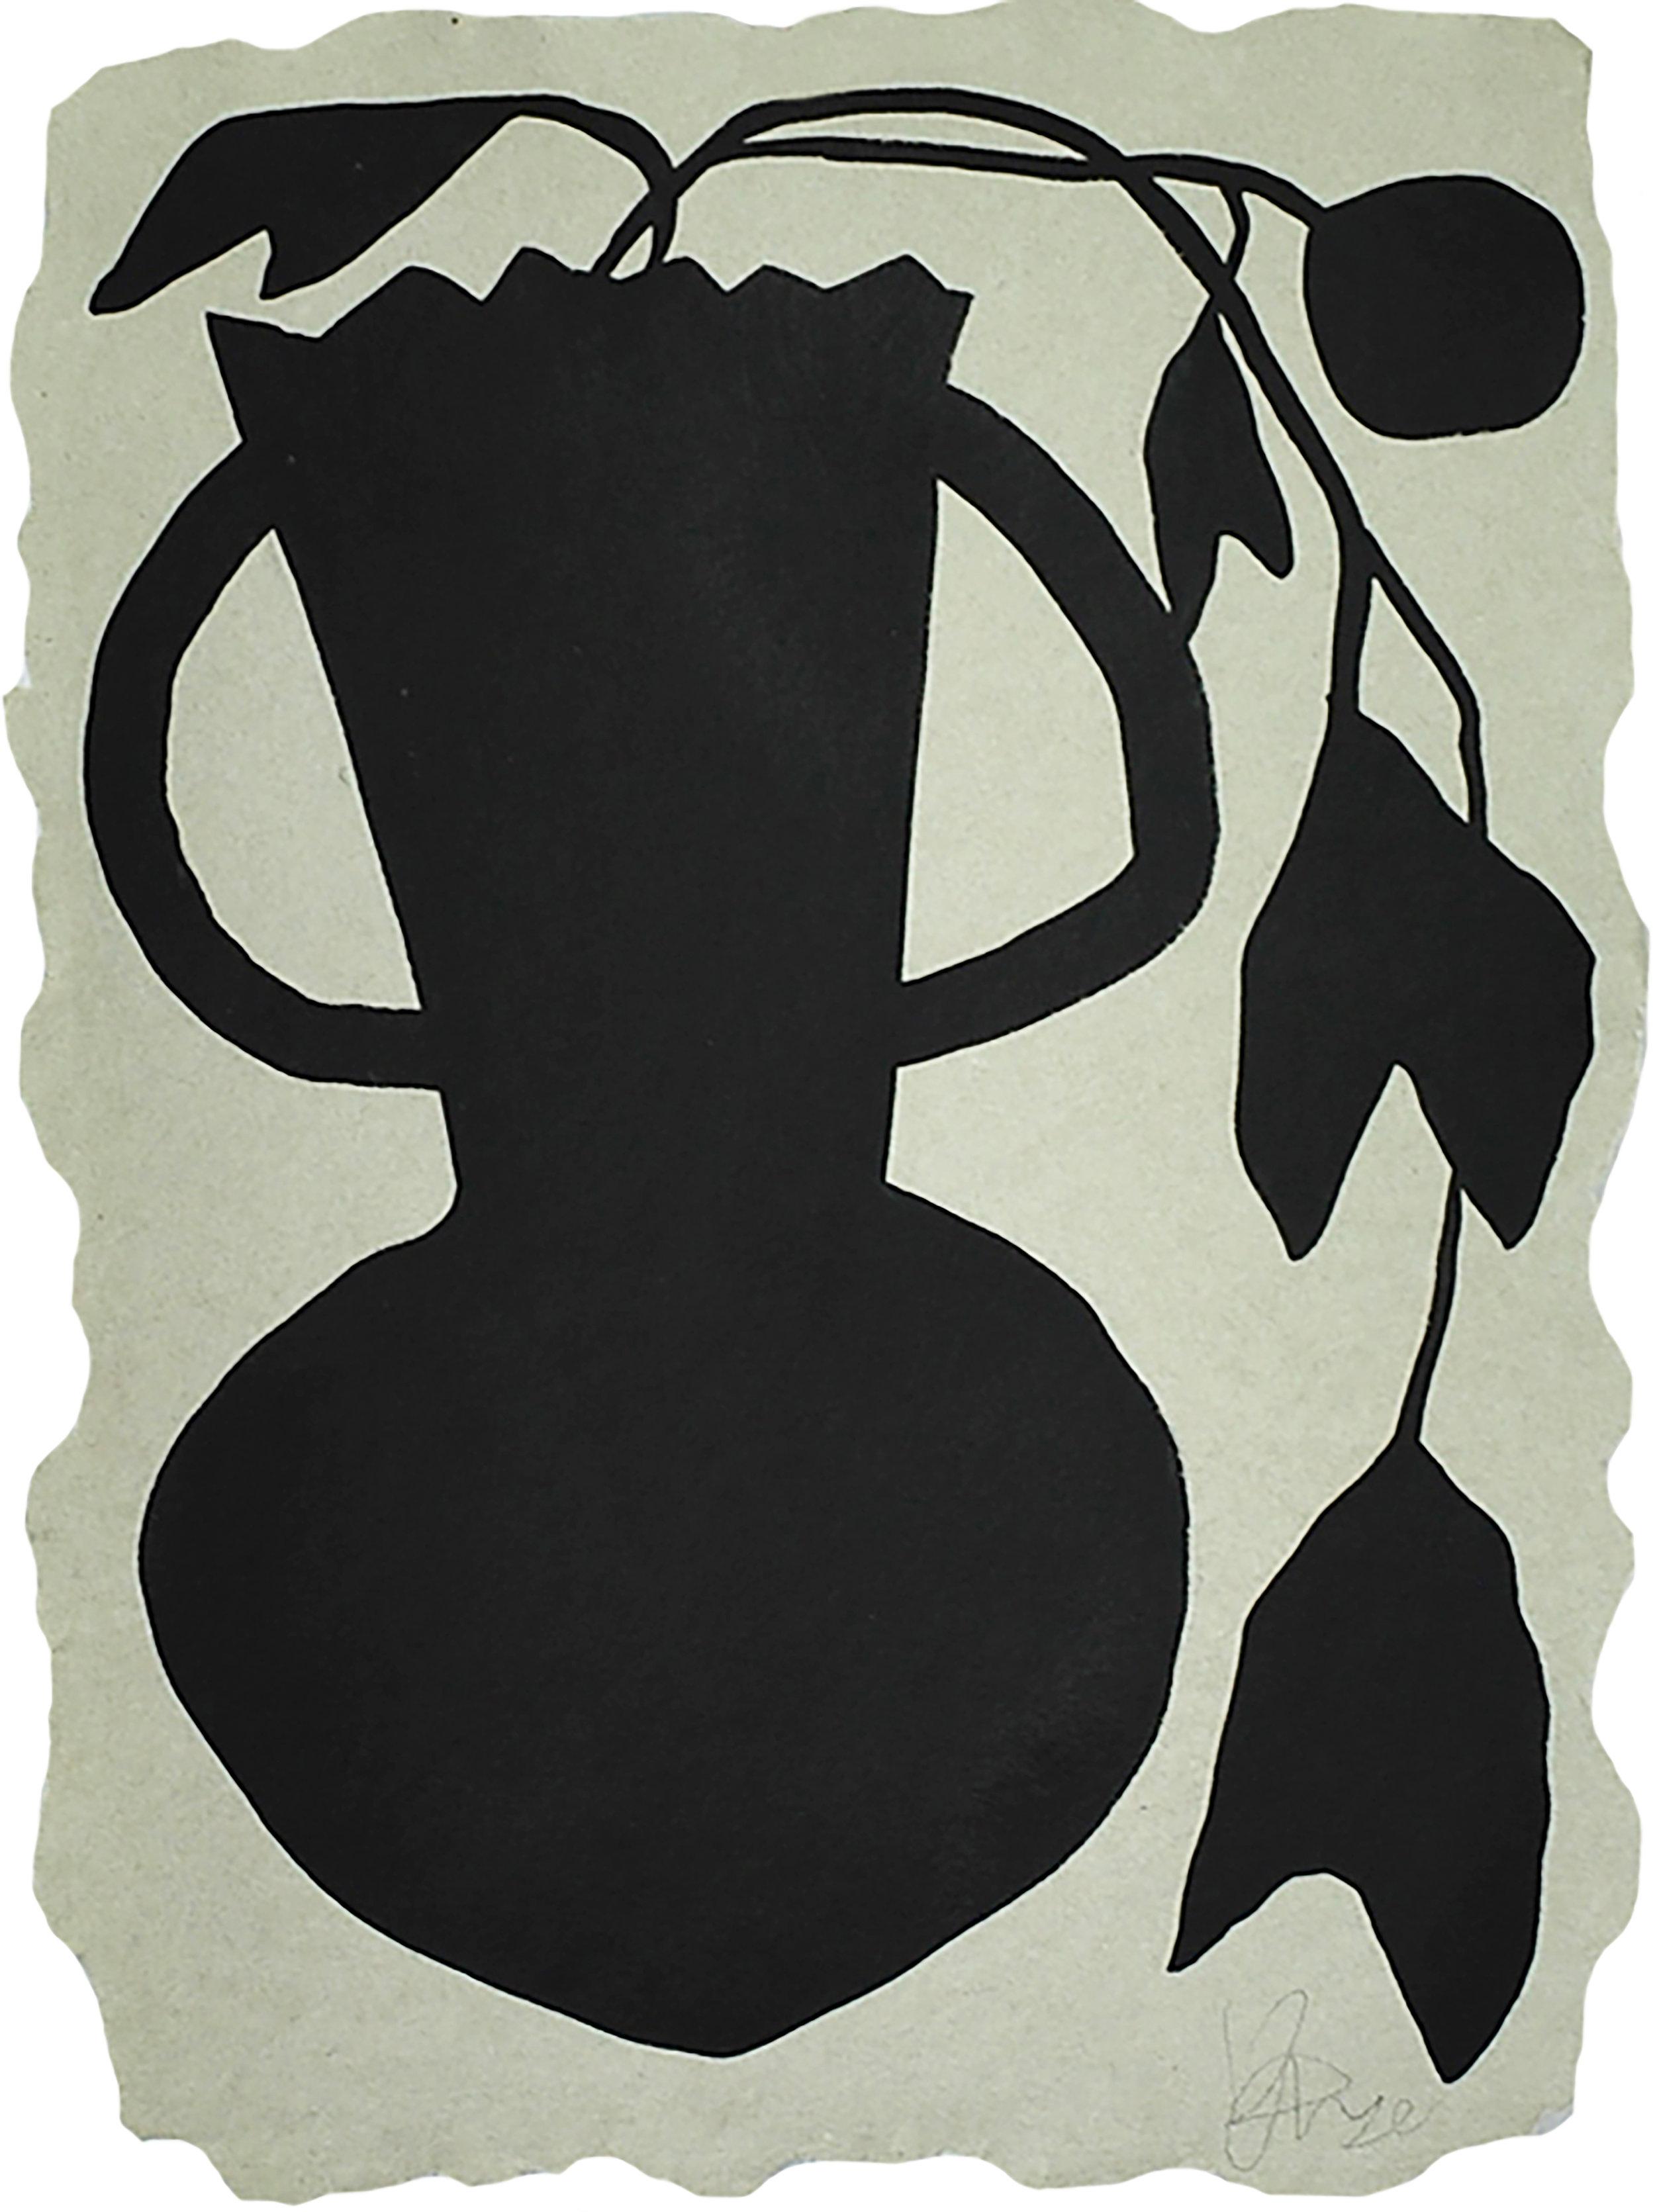 Unusual Vase Four.jpg